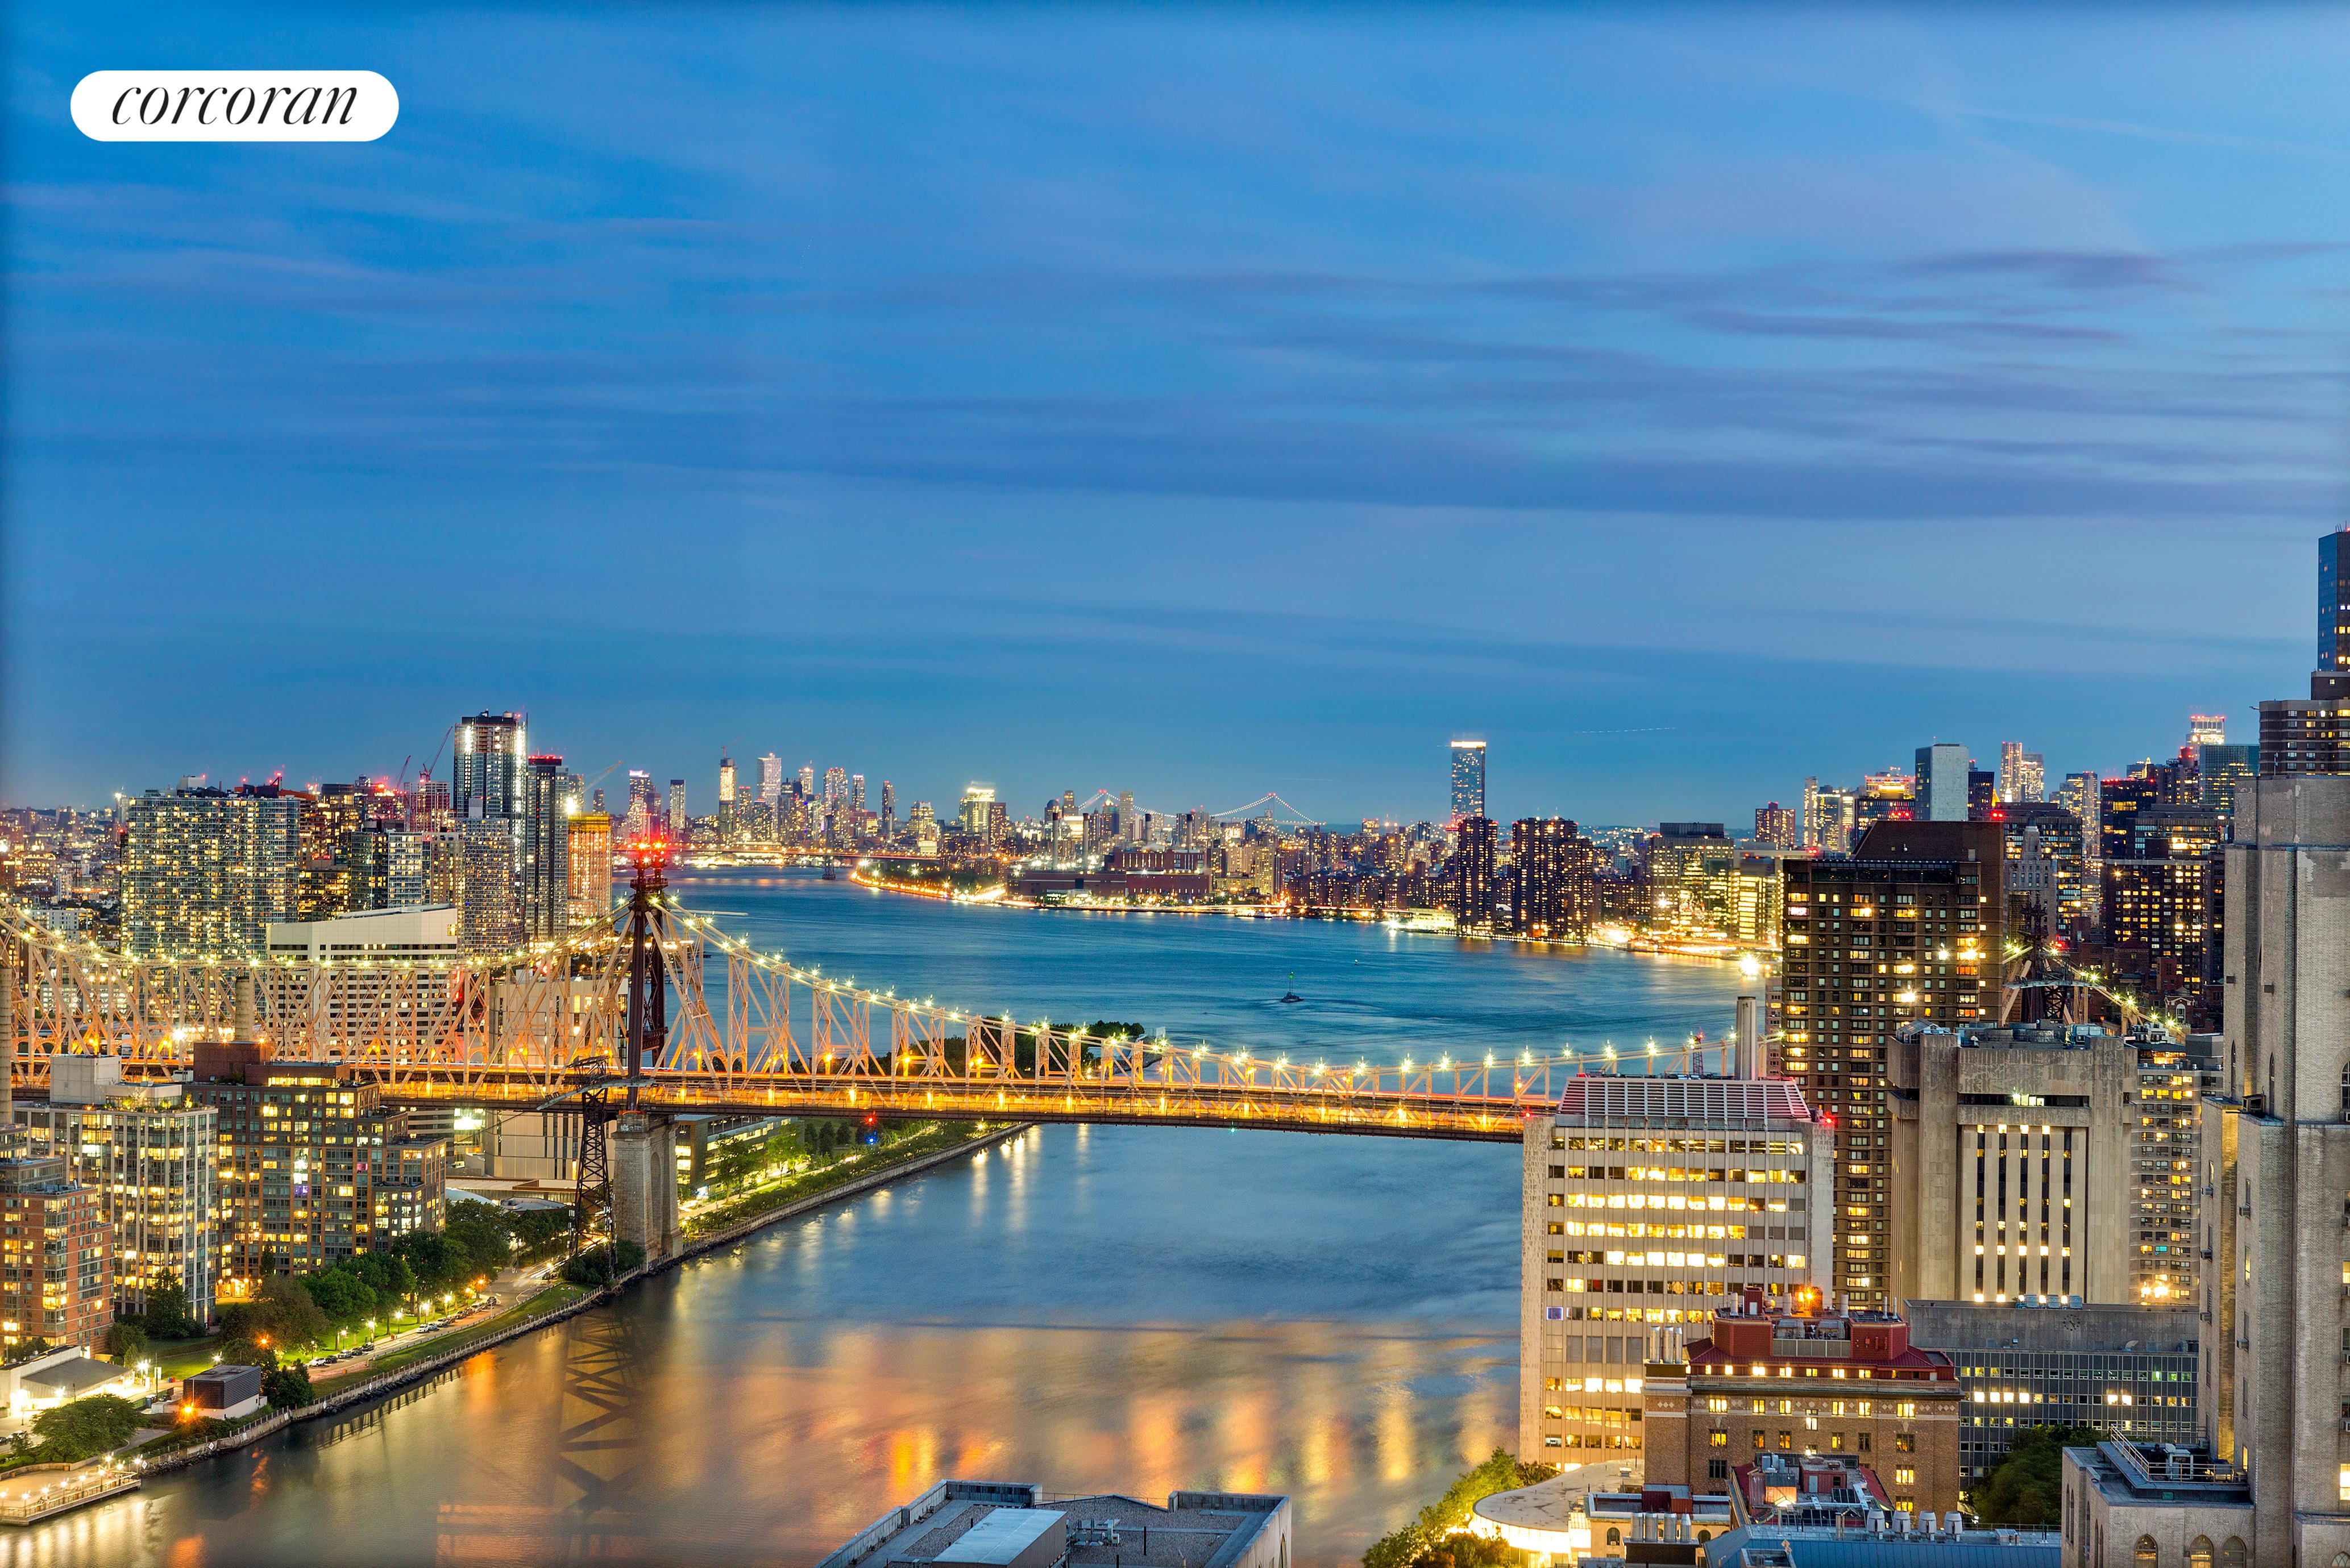 524 East 72nd Street 43ABG Upper East Side New York NY 10021